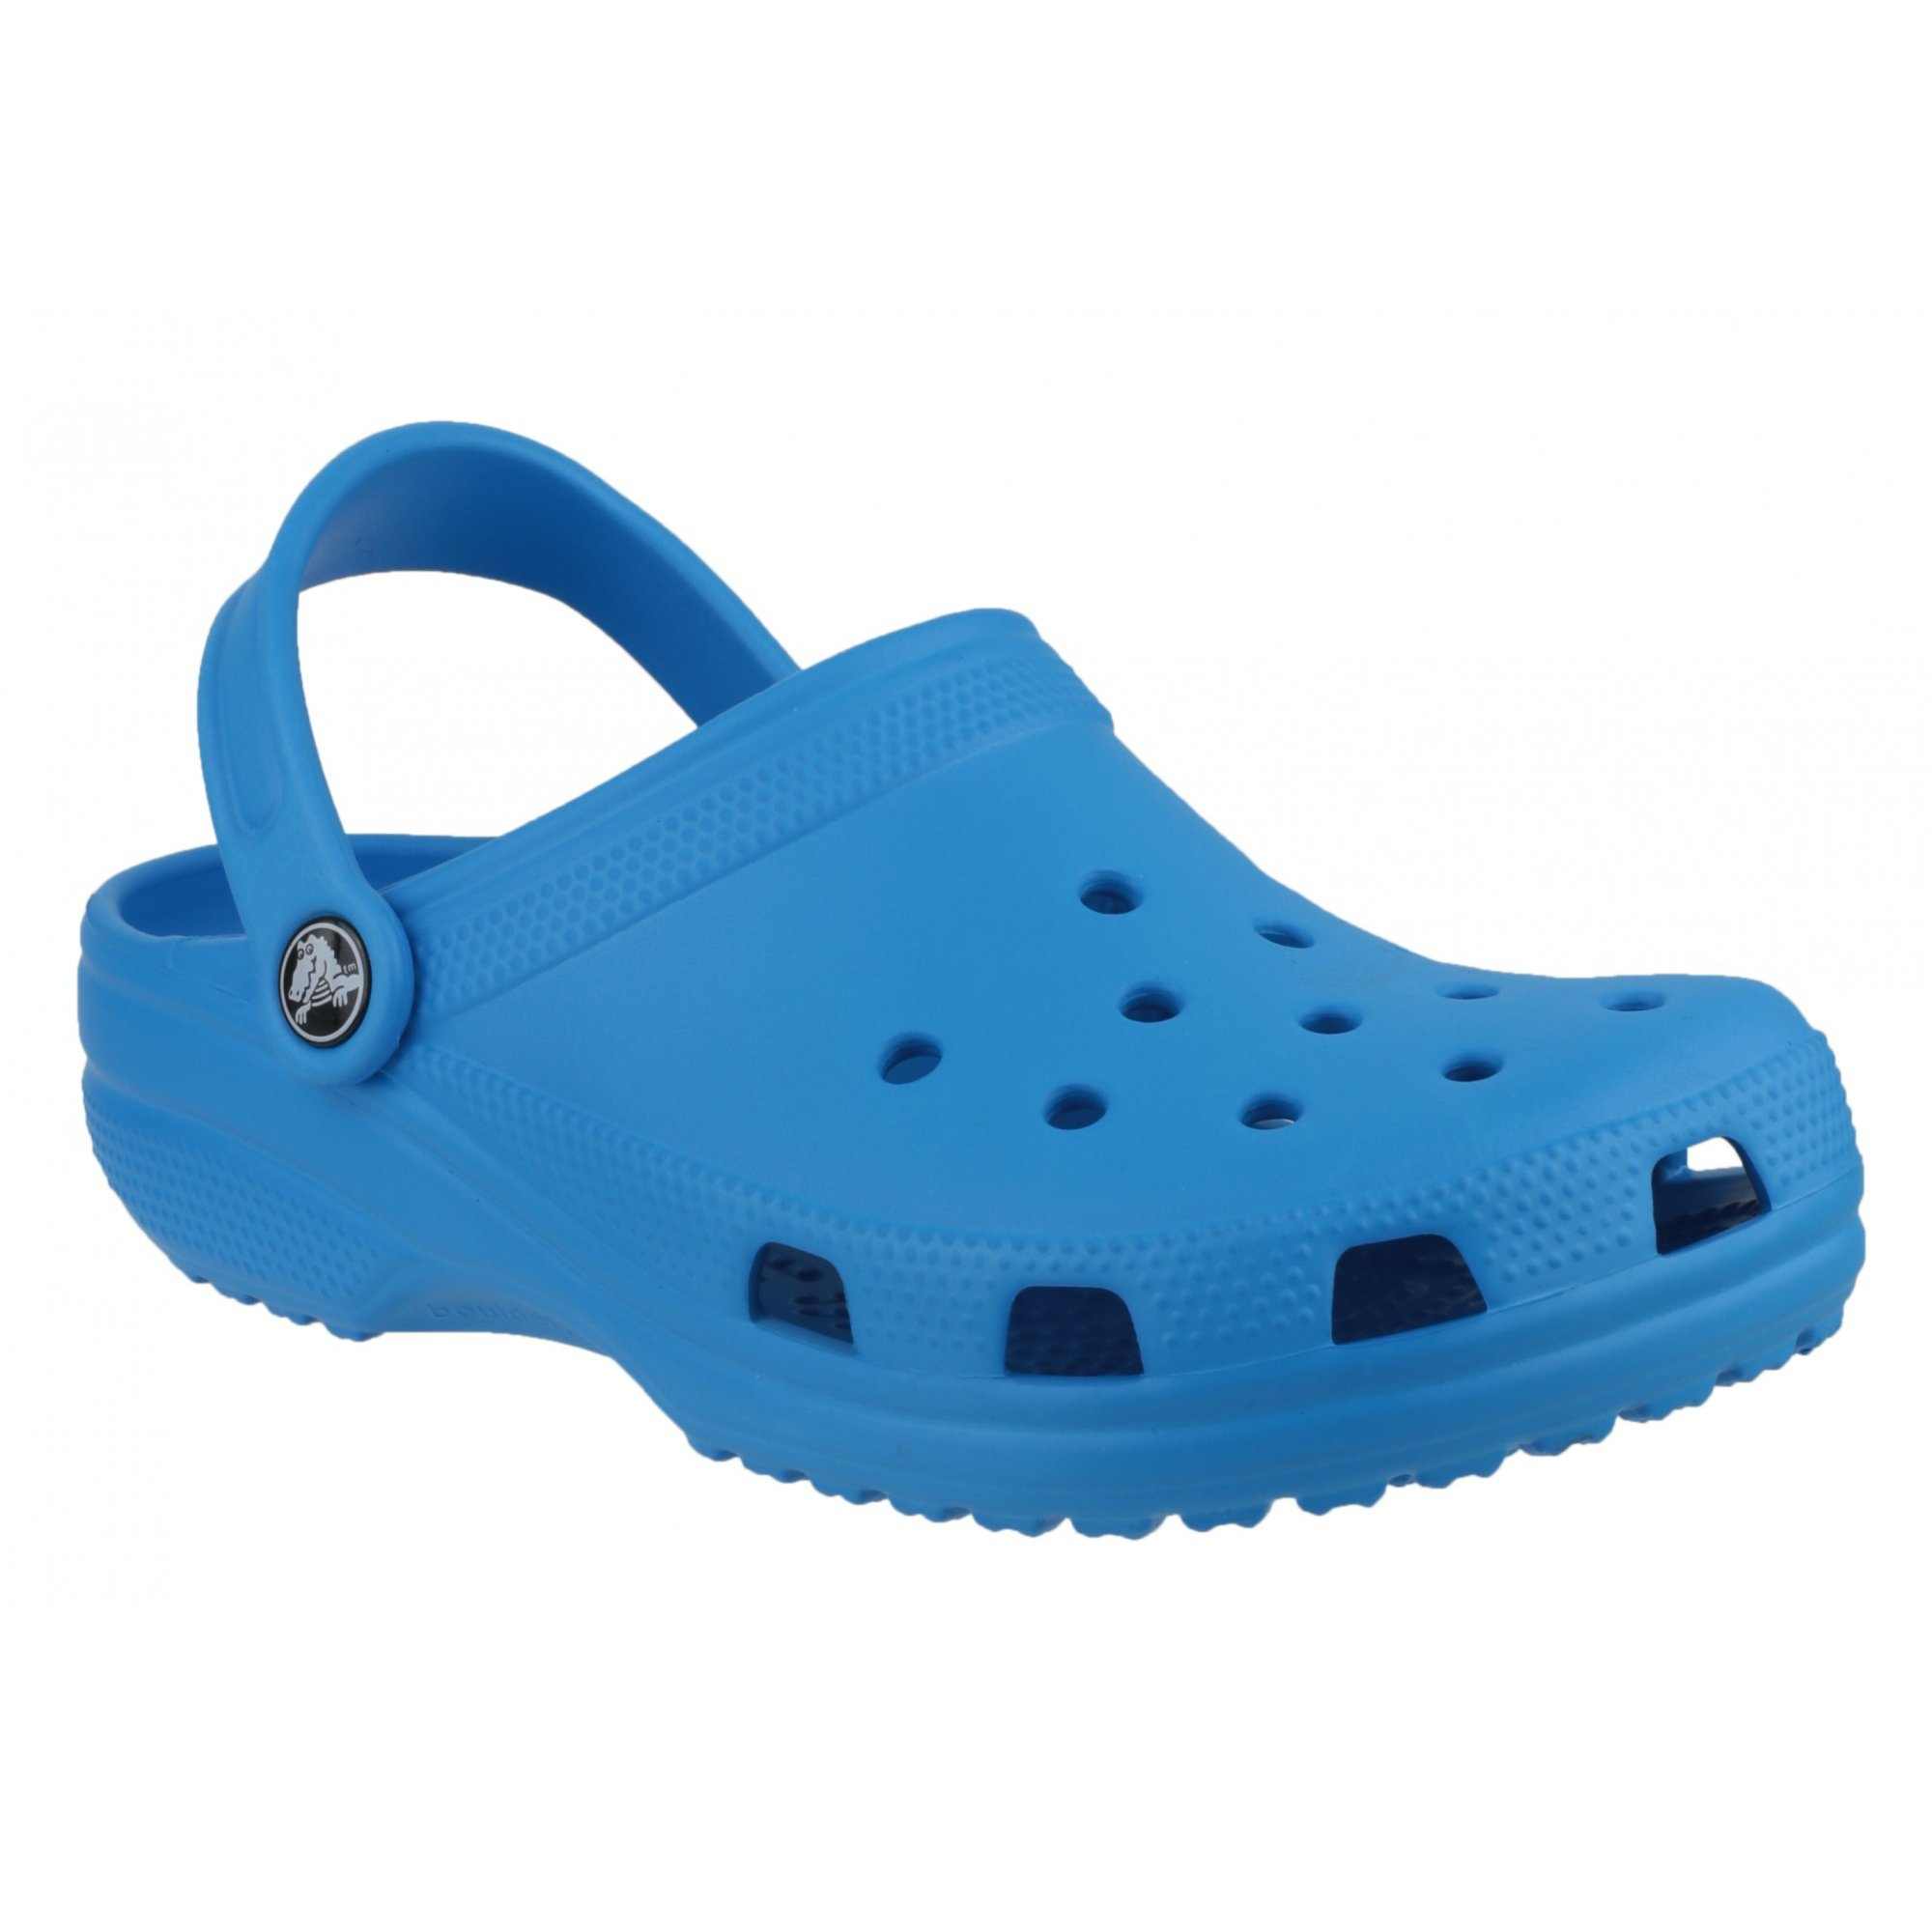 Crocs Childrens/Kids Classic Clogs (US Child 6) (Ocean)